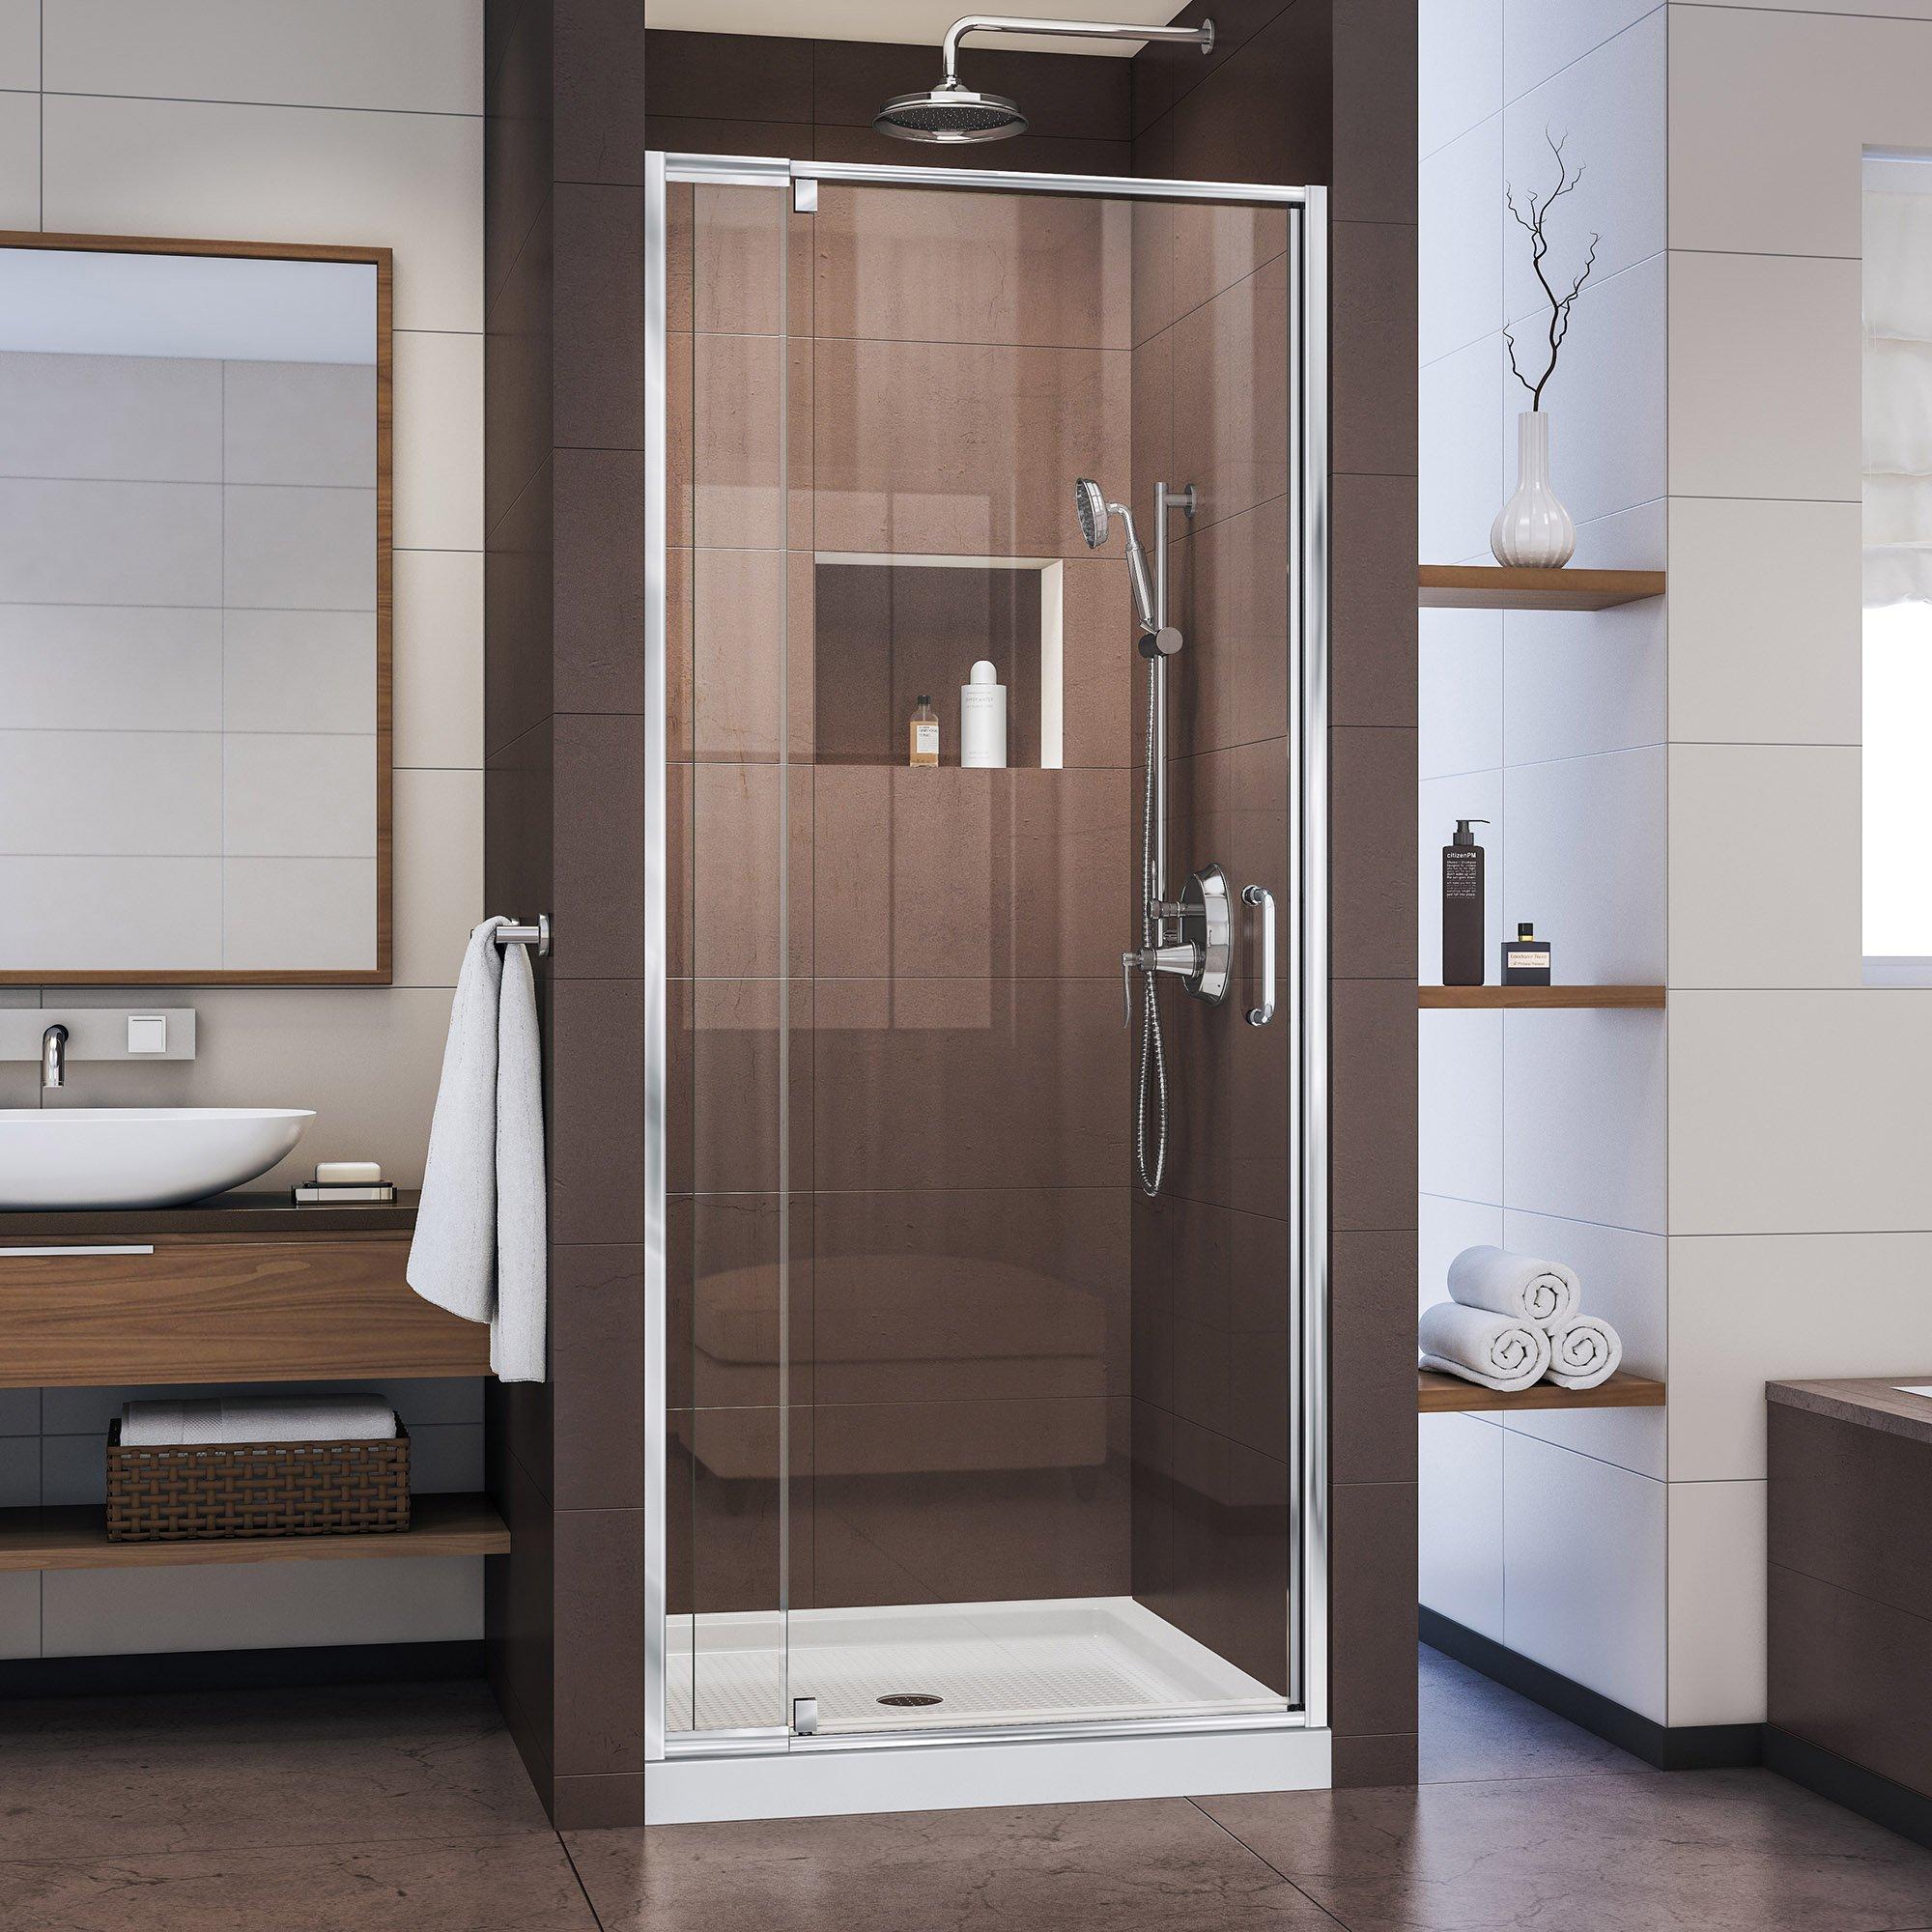 DreamLine DL-6215C-01CL Flex 32'' W x 32'' D x 74-3/4'' H Frameless Shower Door and Base Kit, Chrome by DreamLine